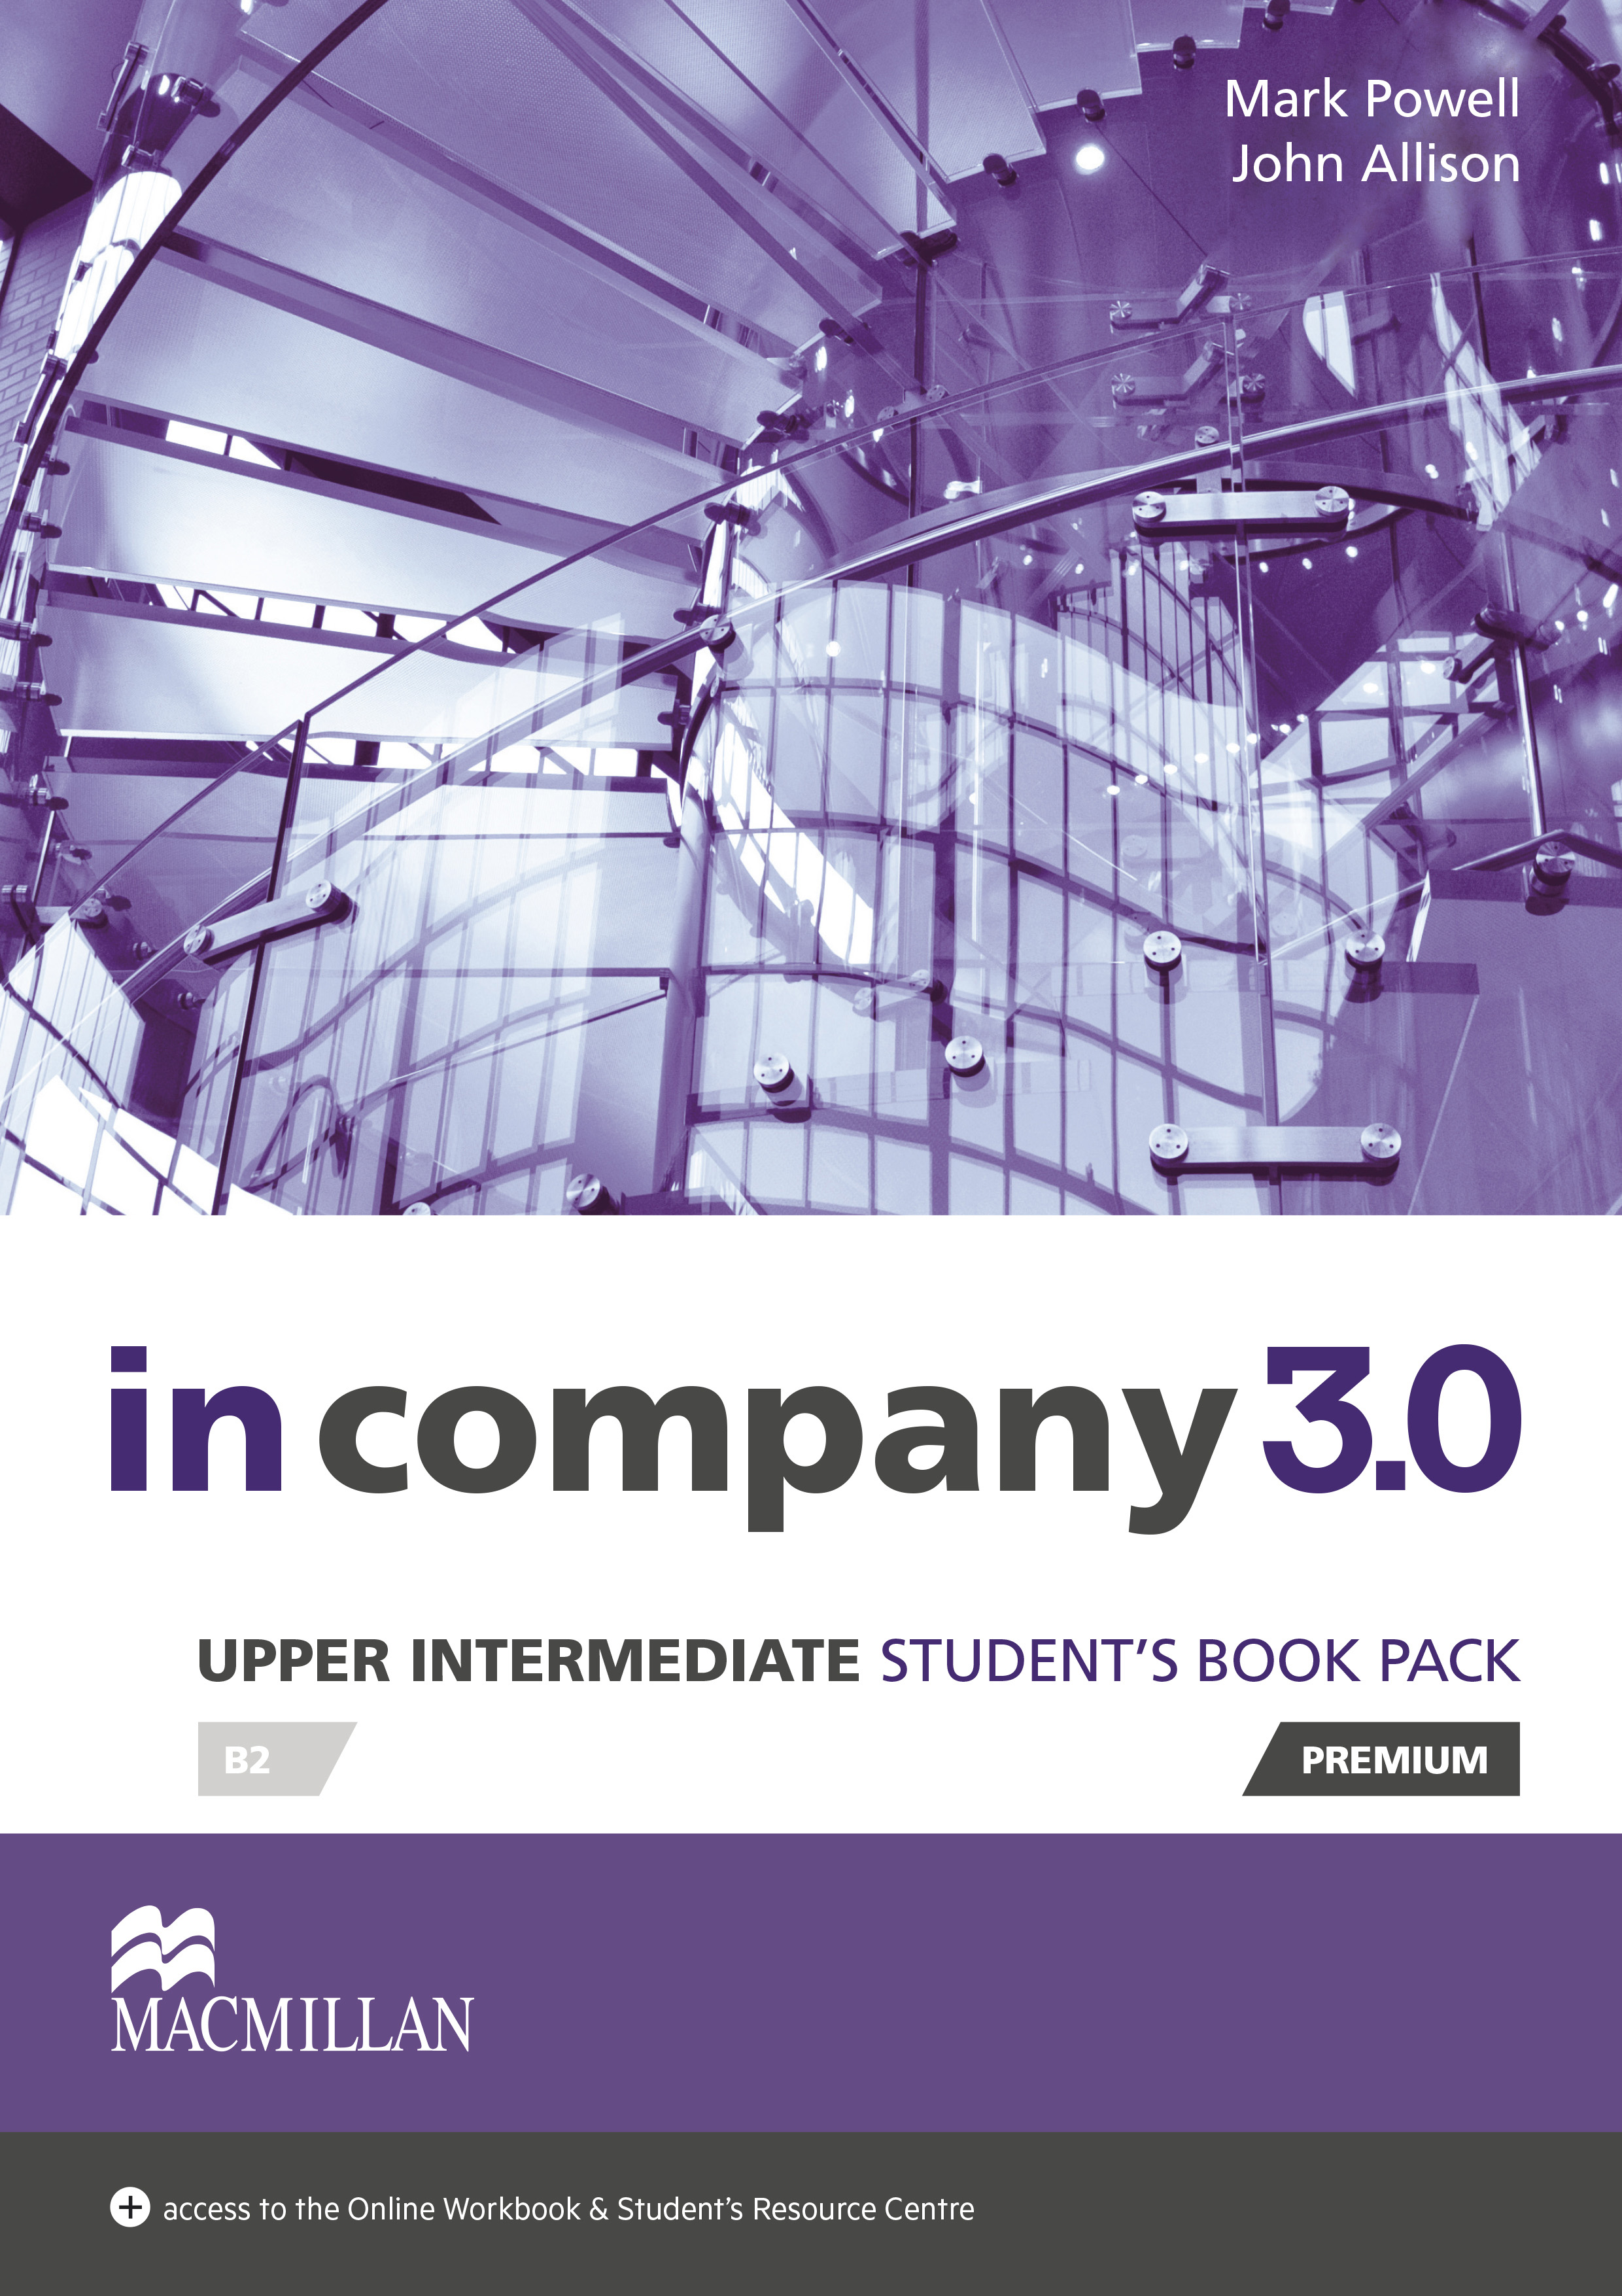 In Company 3.0 Upper Intermediate Level Student